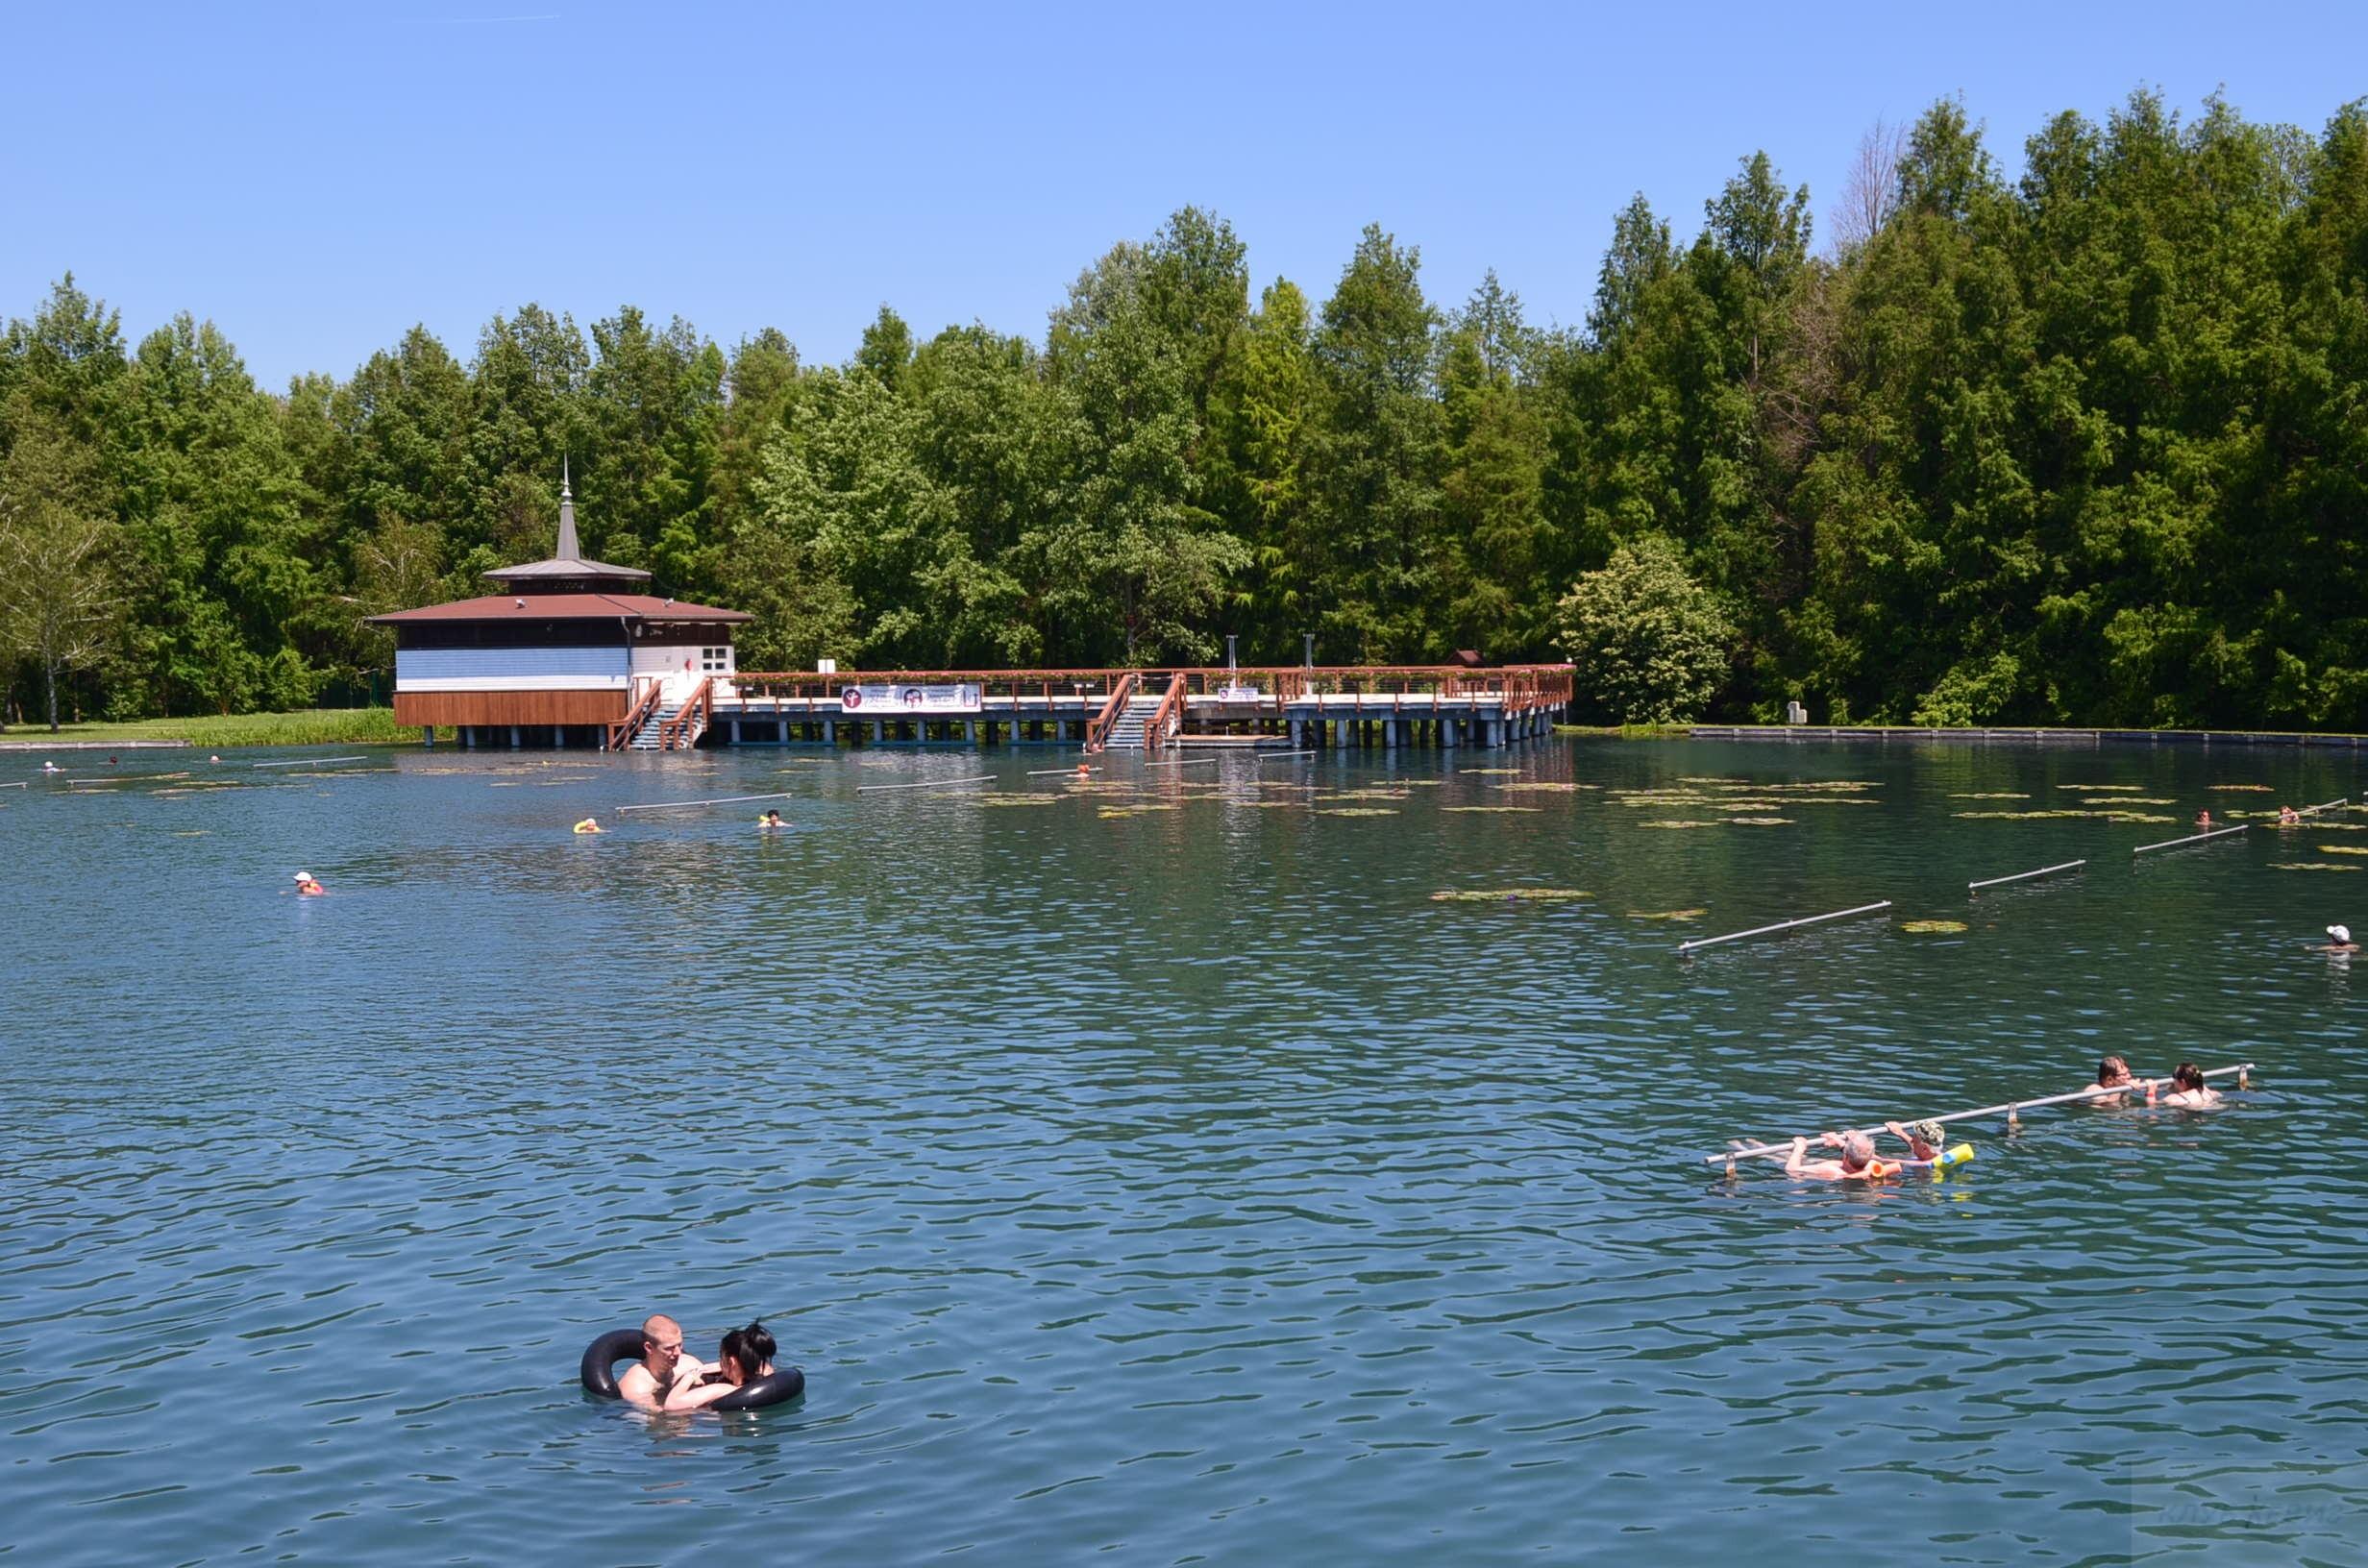 Хевиз озеро. Фитнес площадка.